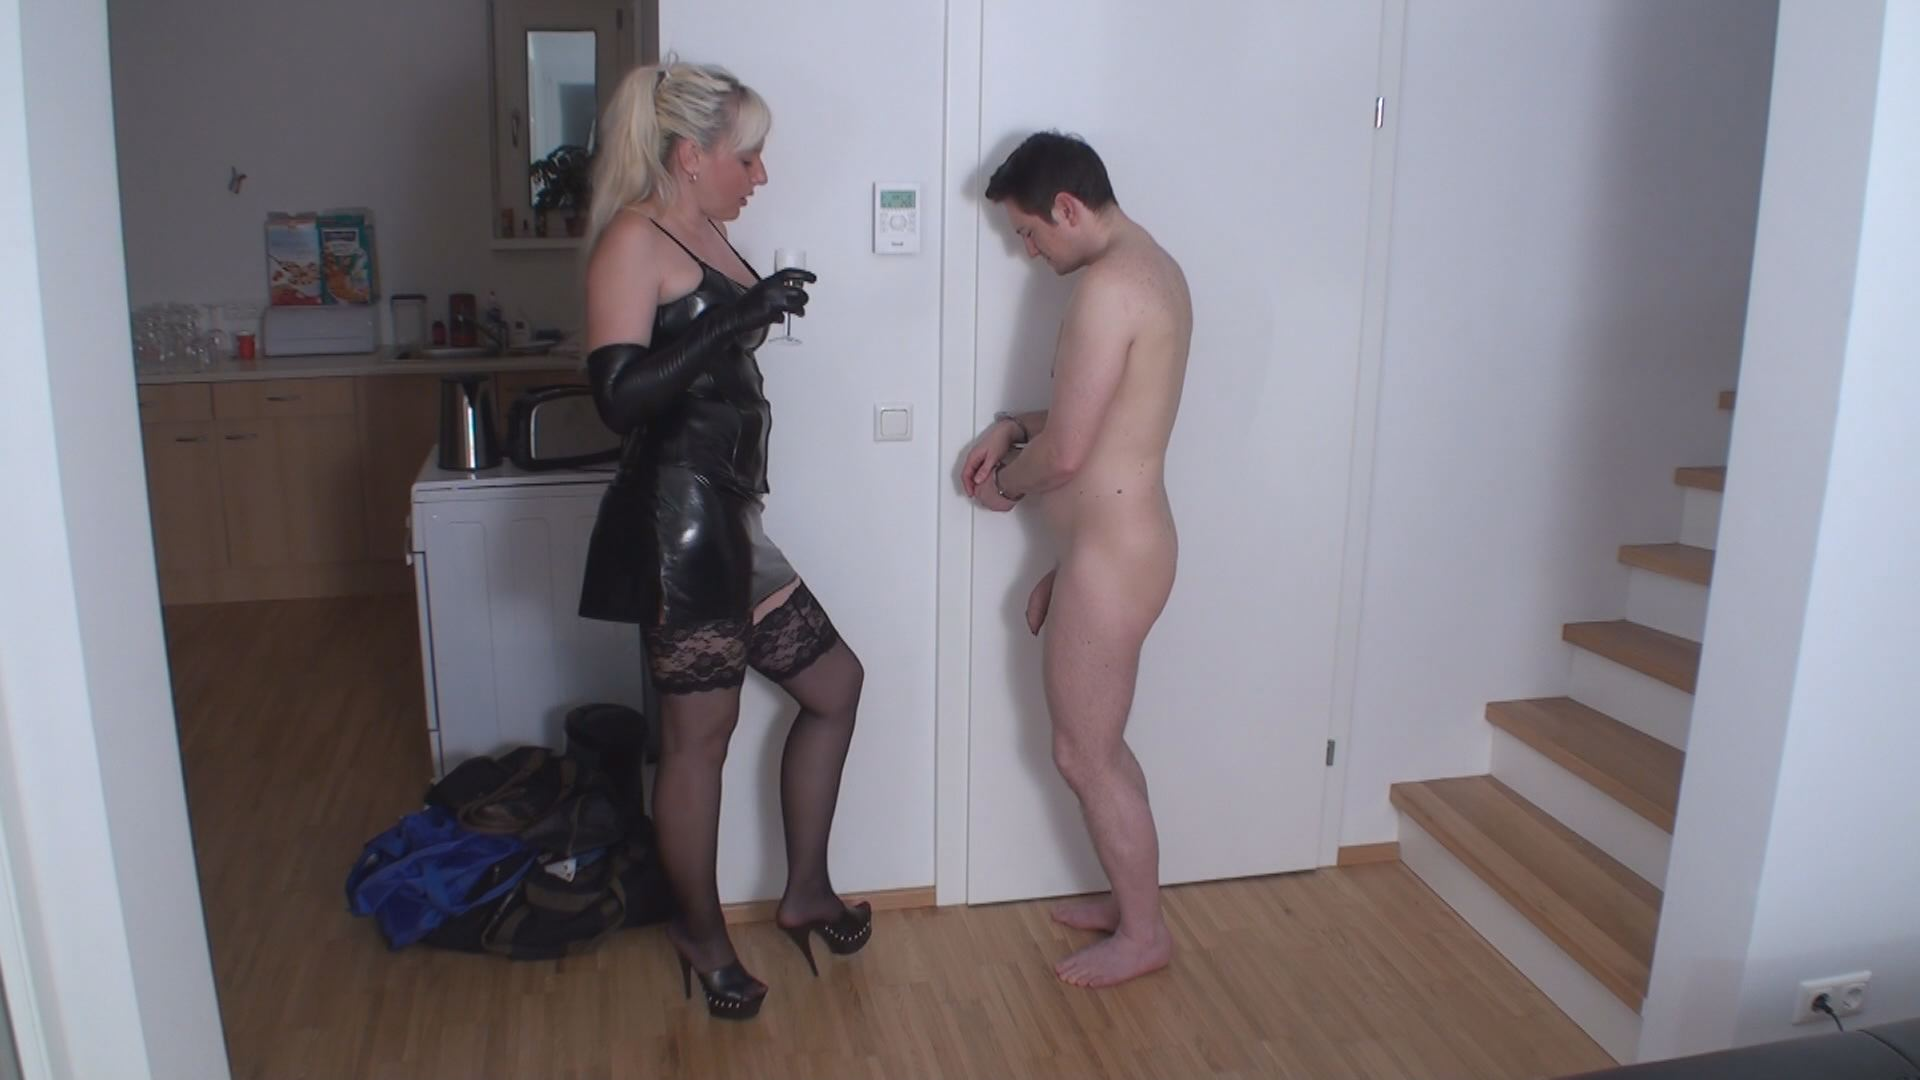 Humiliation 79